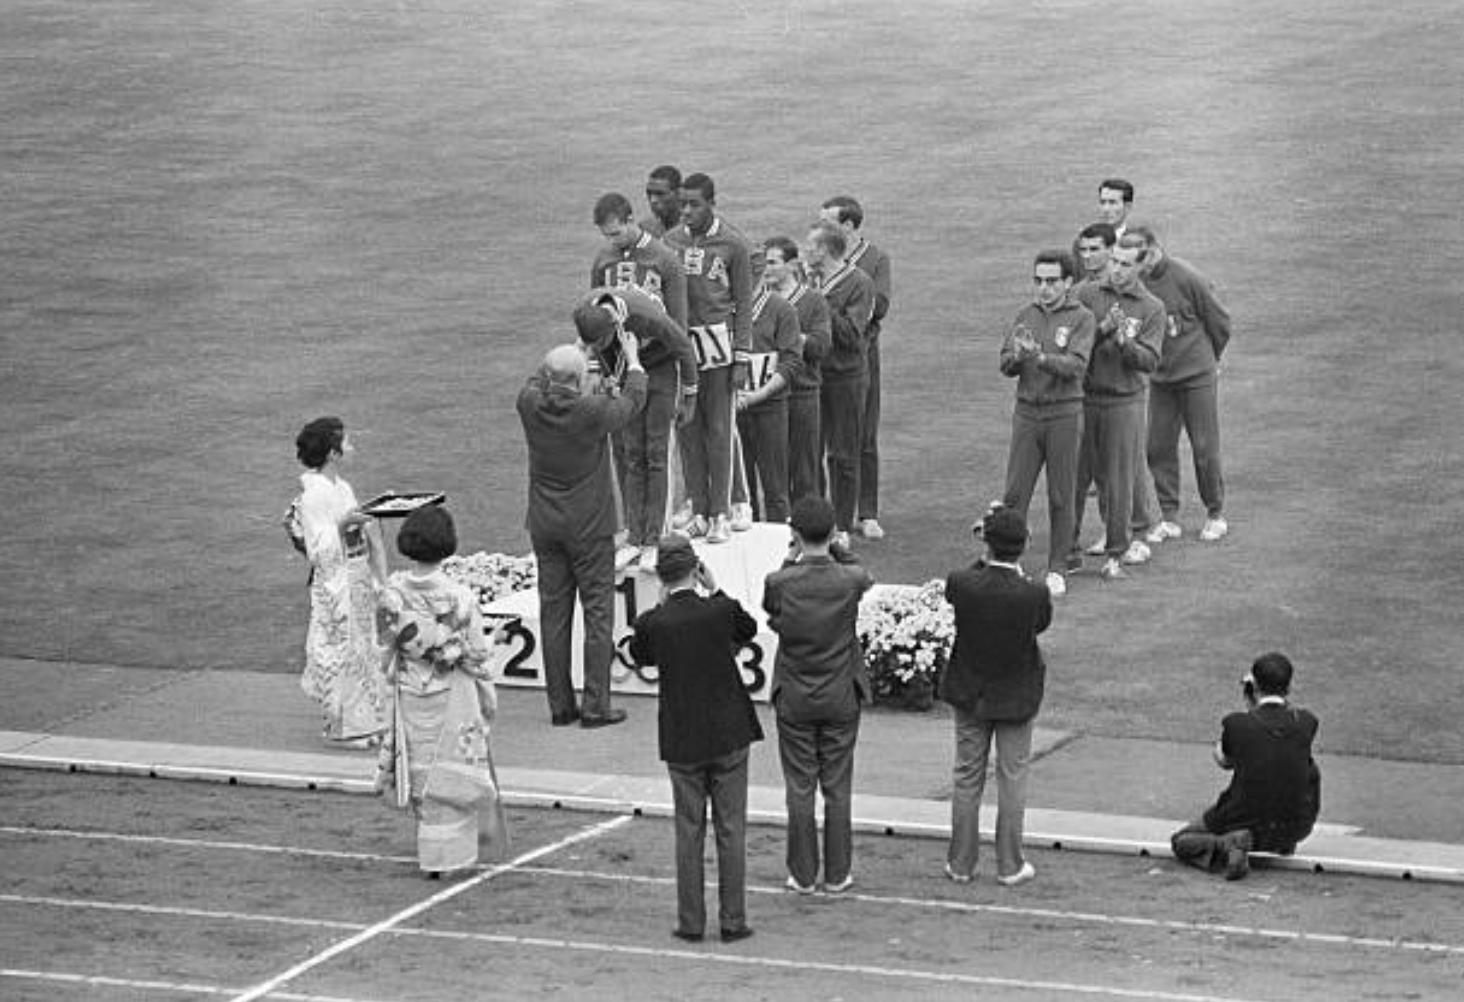 Medali Maraton Dikasih Saat Closing Ceremony, Ternyata Ini Alasannya